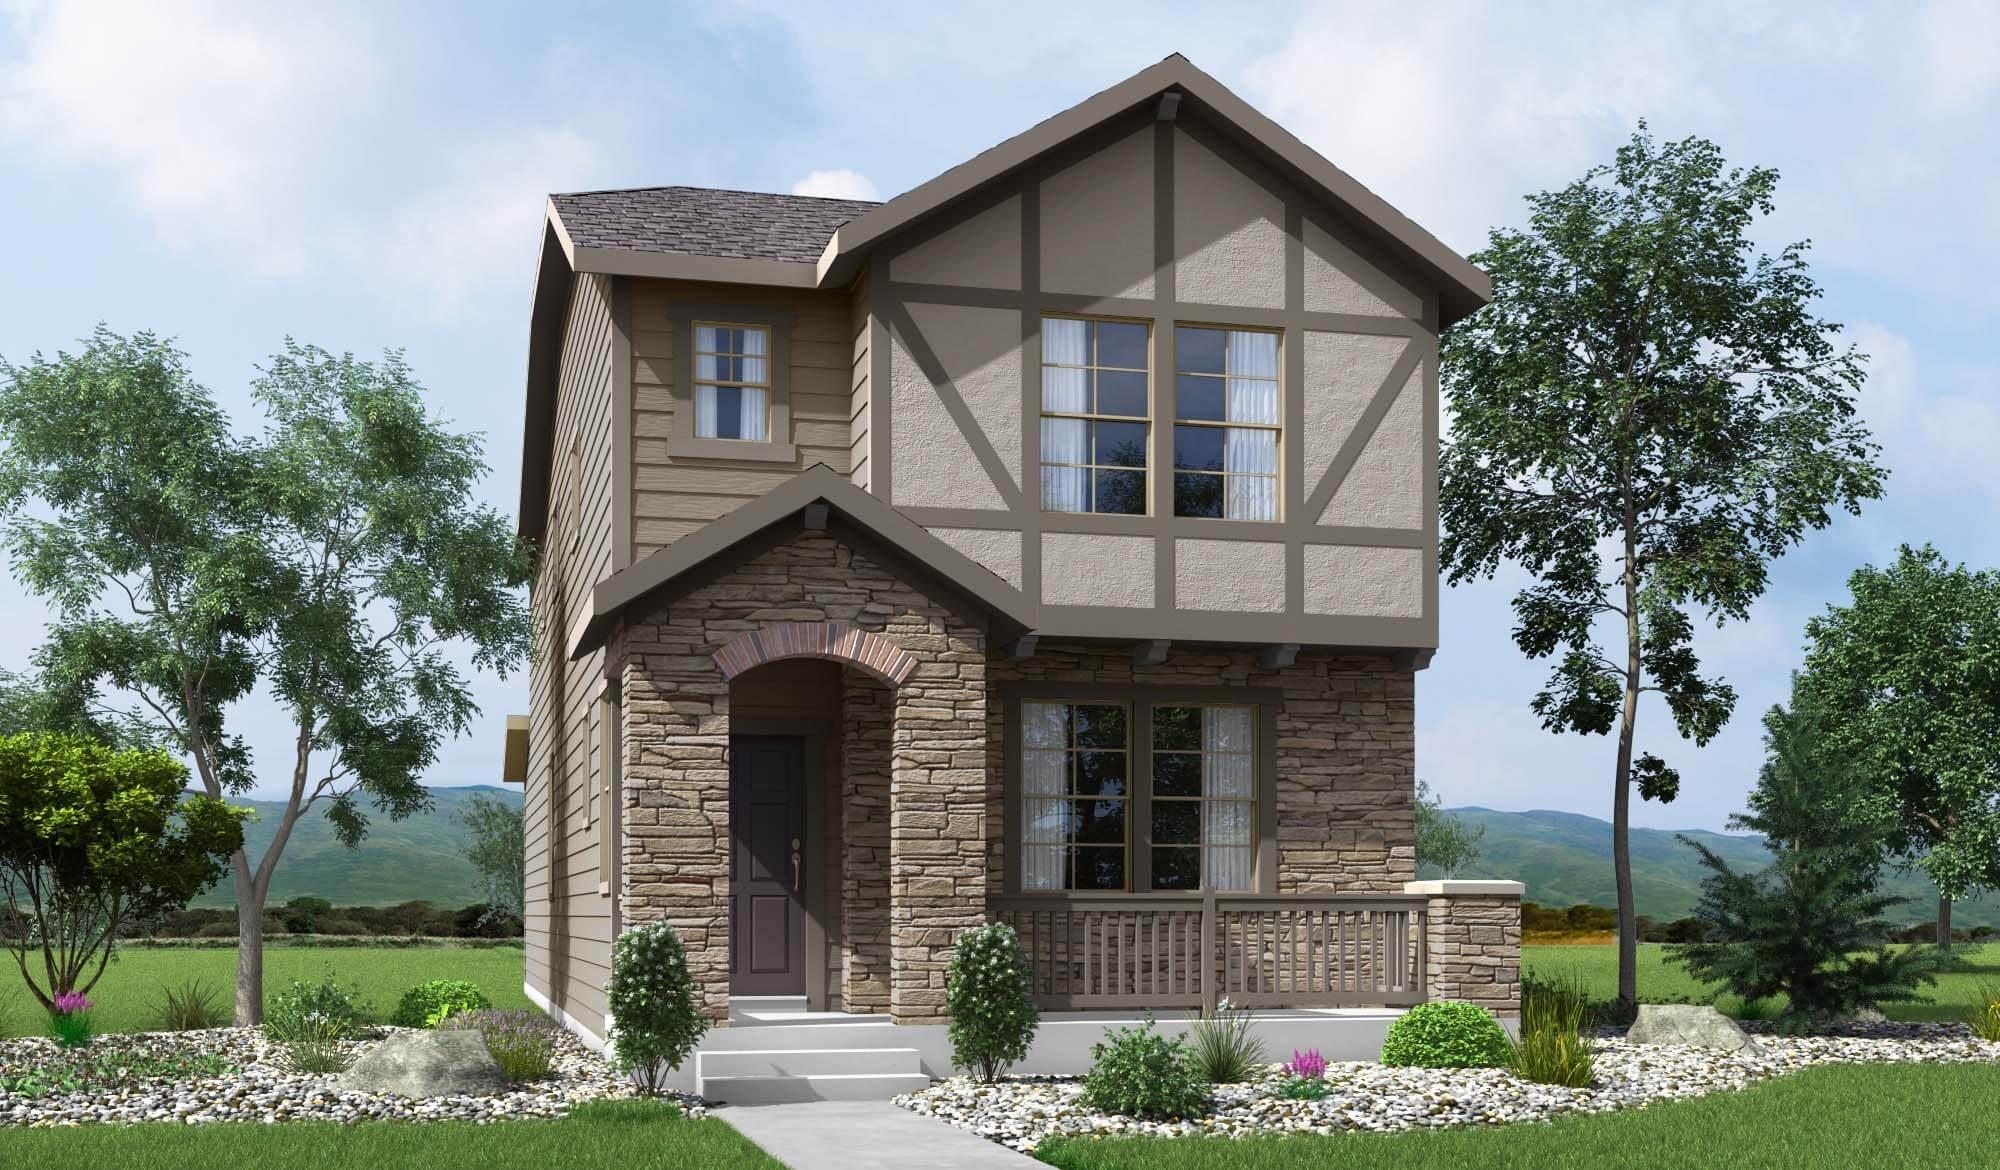 A52262_Village_Homes_Denver_Connection_22s_22C2_C__HERO20170509132615